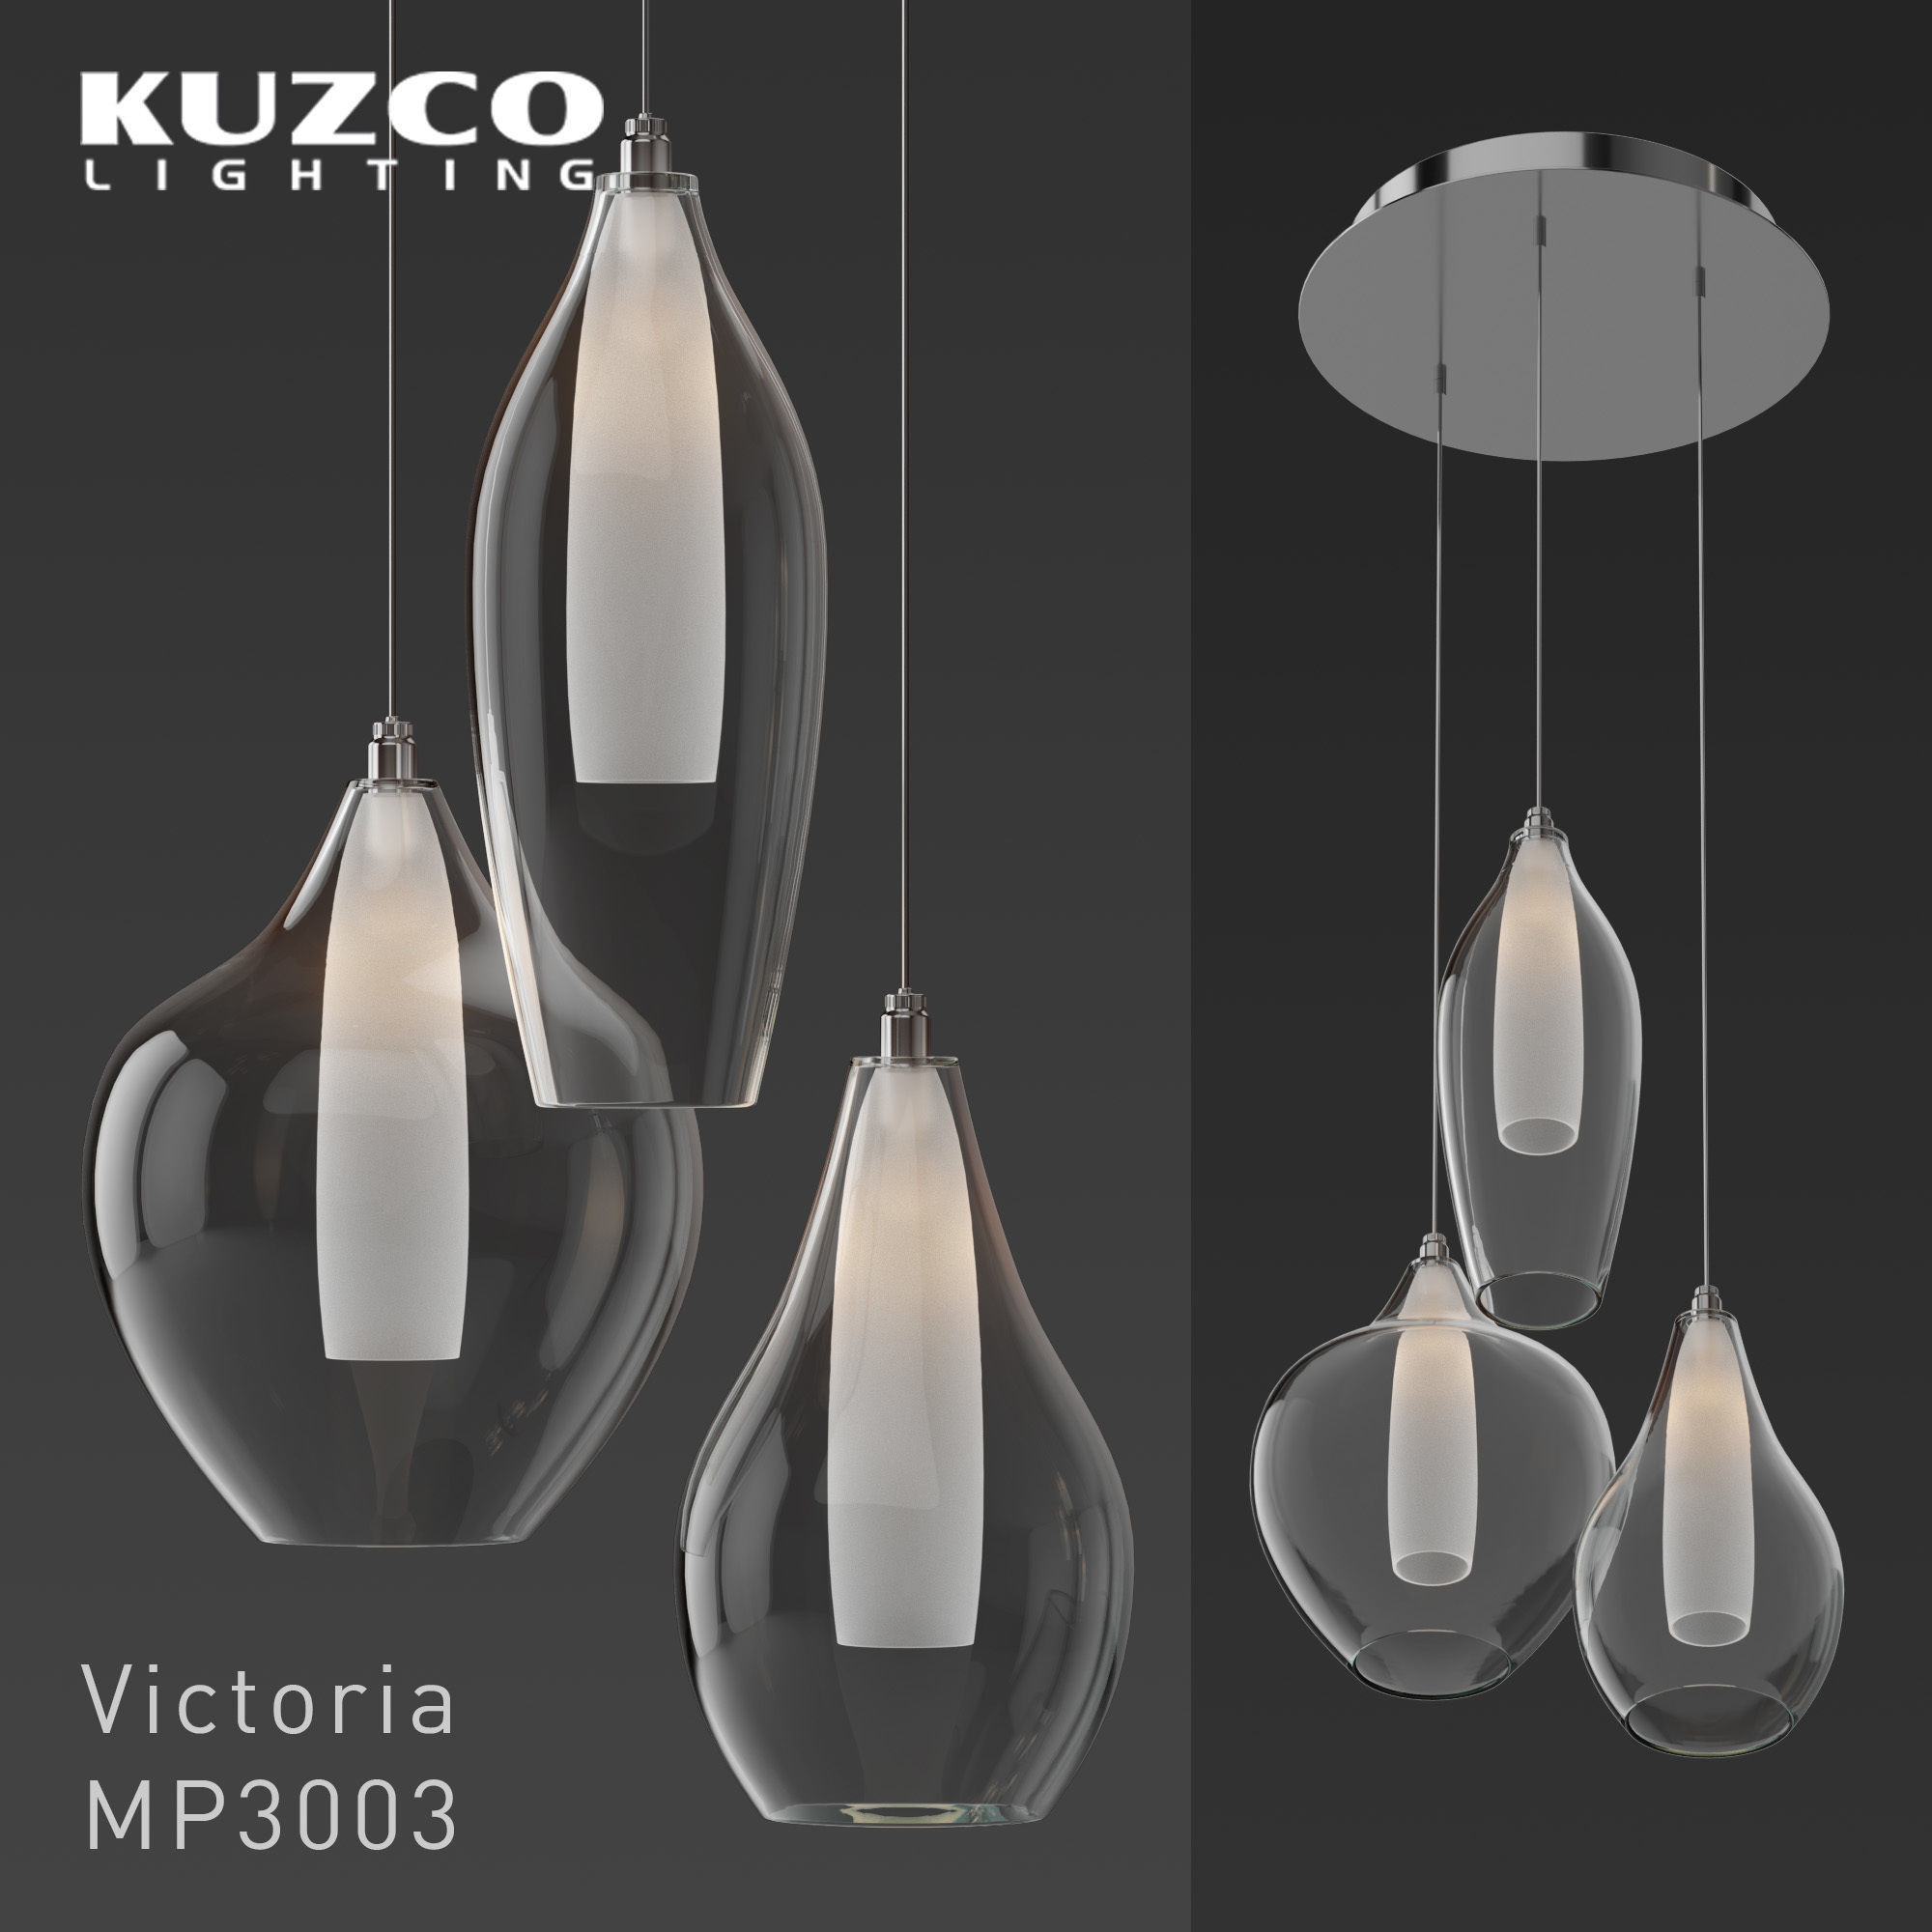 Kuzco Lighting Victoria Mp3003 Pendant Light Model